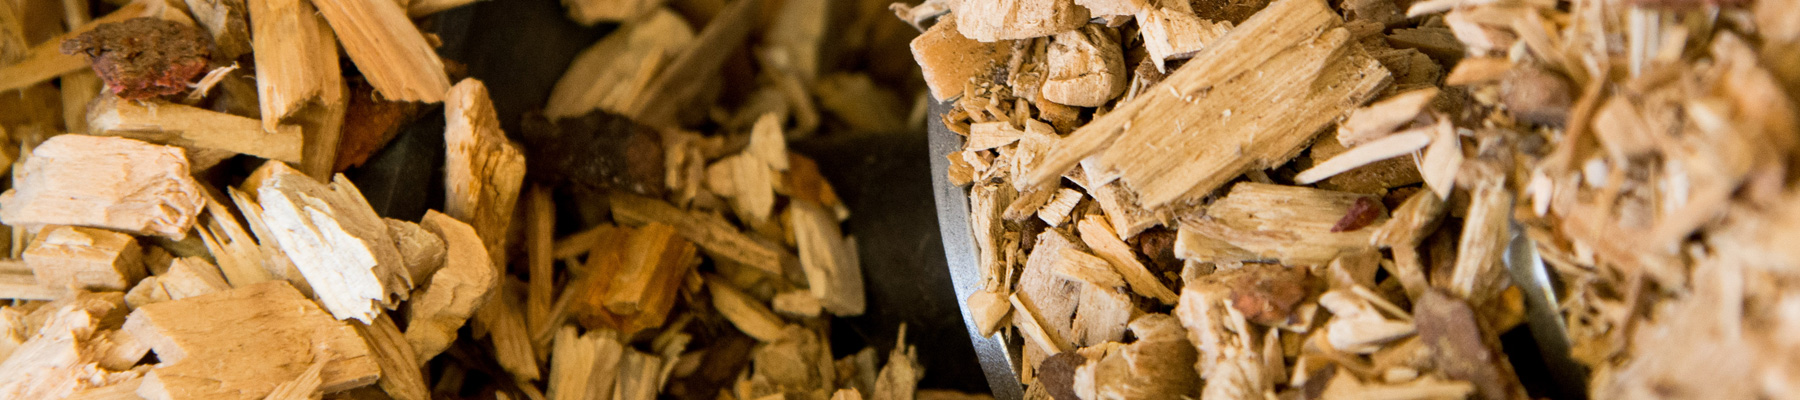 Why-choose-biomass heat9